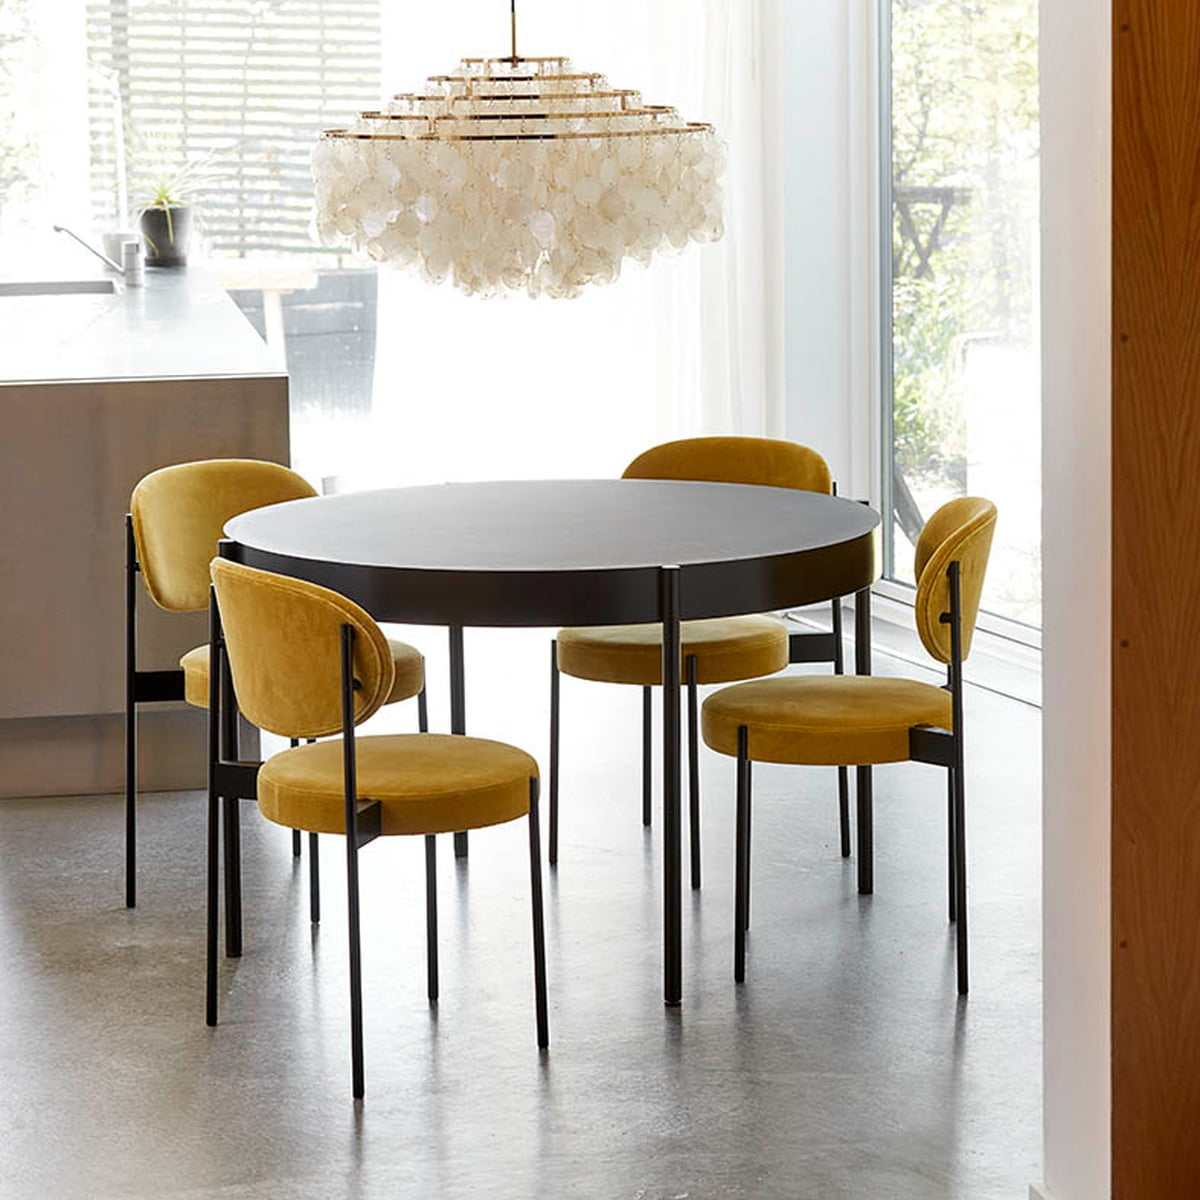 tisch 430 120 cm verpan. Black Bedroom Furniture Sets. Home Design Ideas